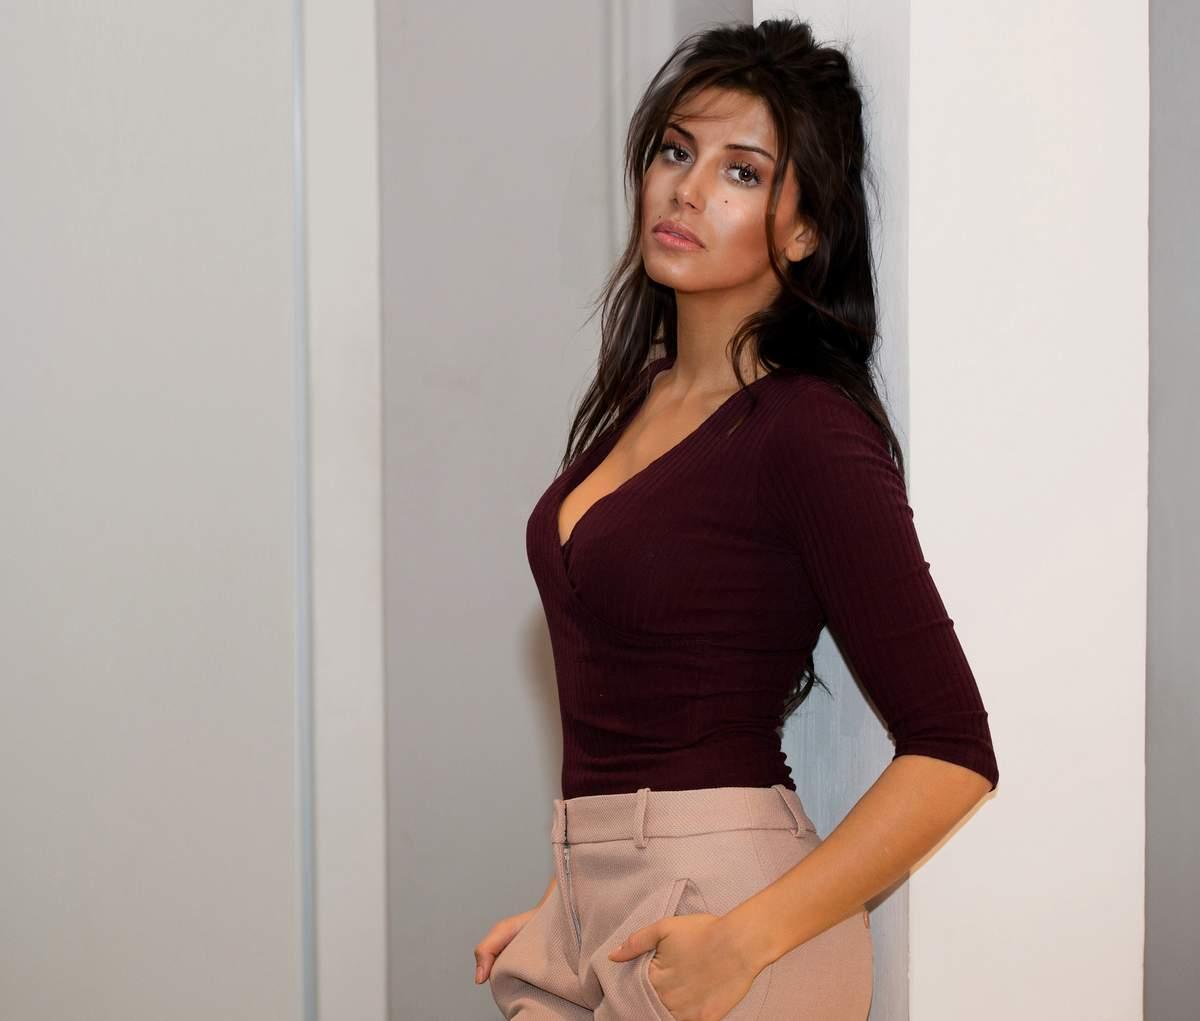 Leila Boumedjane en débardeur décolletée